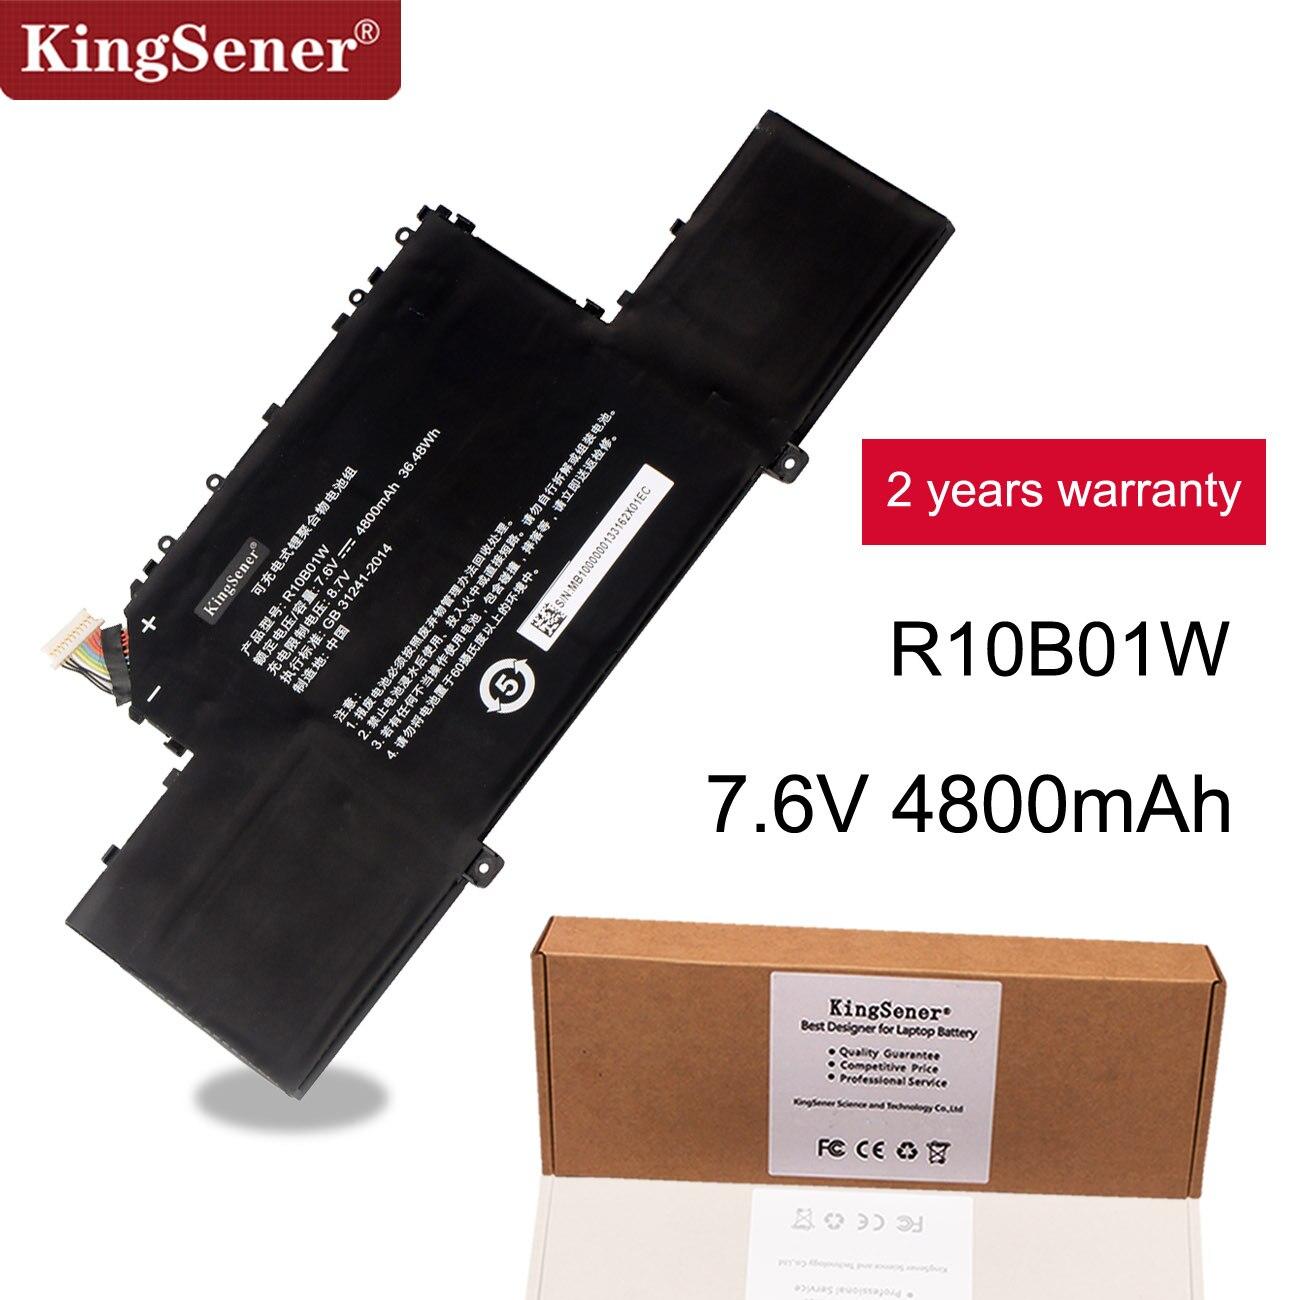 "KingSener R10B01W R10BO1W Аккумулятор для ноутбука Xiaomi Mi Air 12,5 ""серии Tablet 7,6 V 4800 mAh/36.48WH"